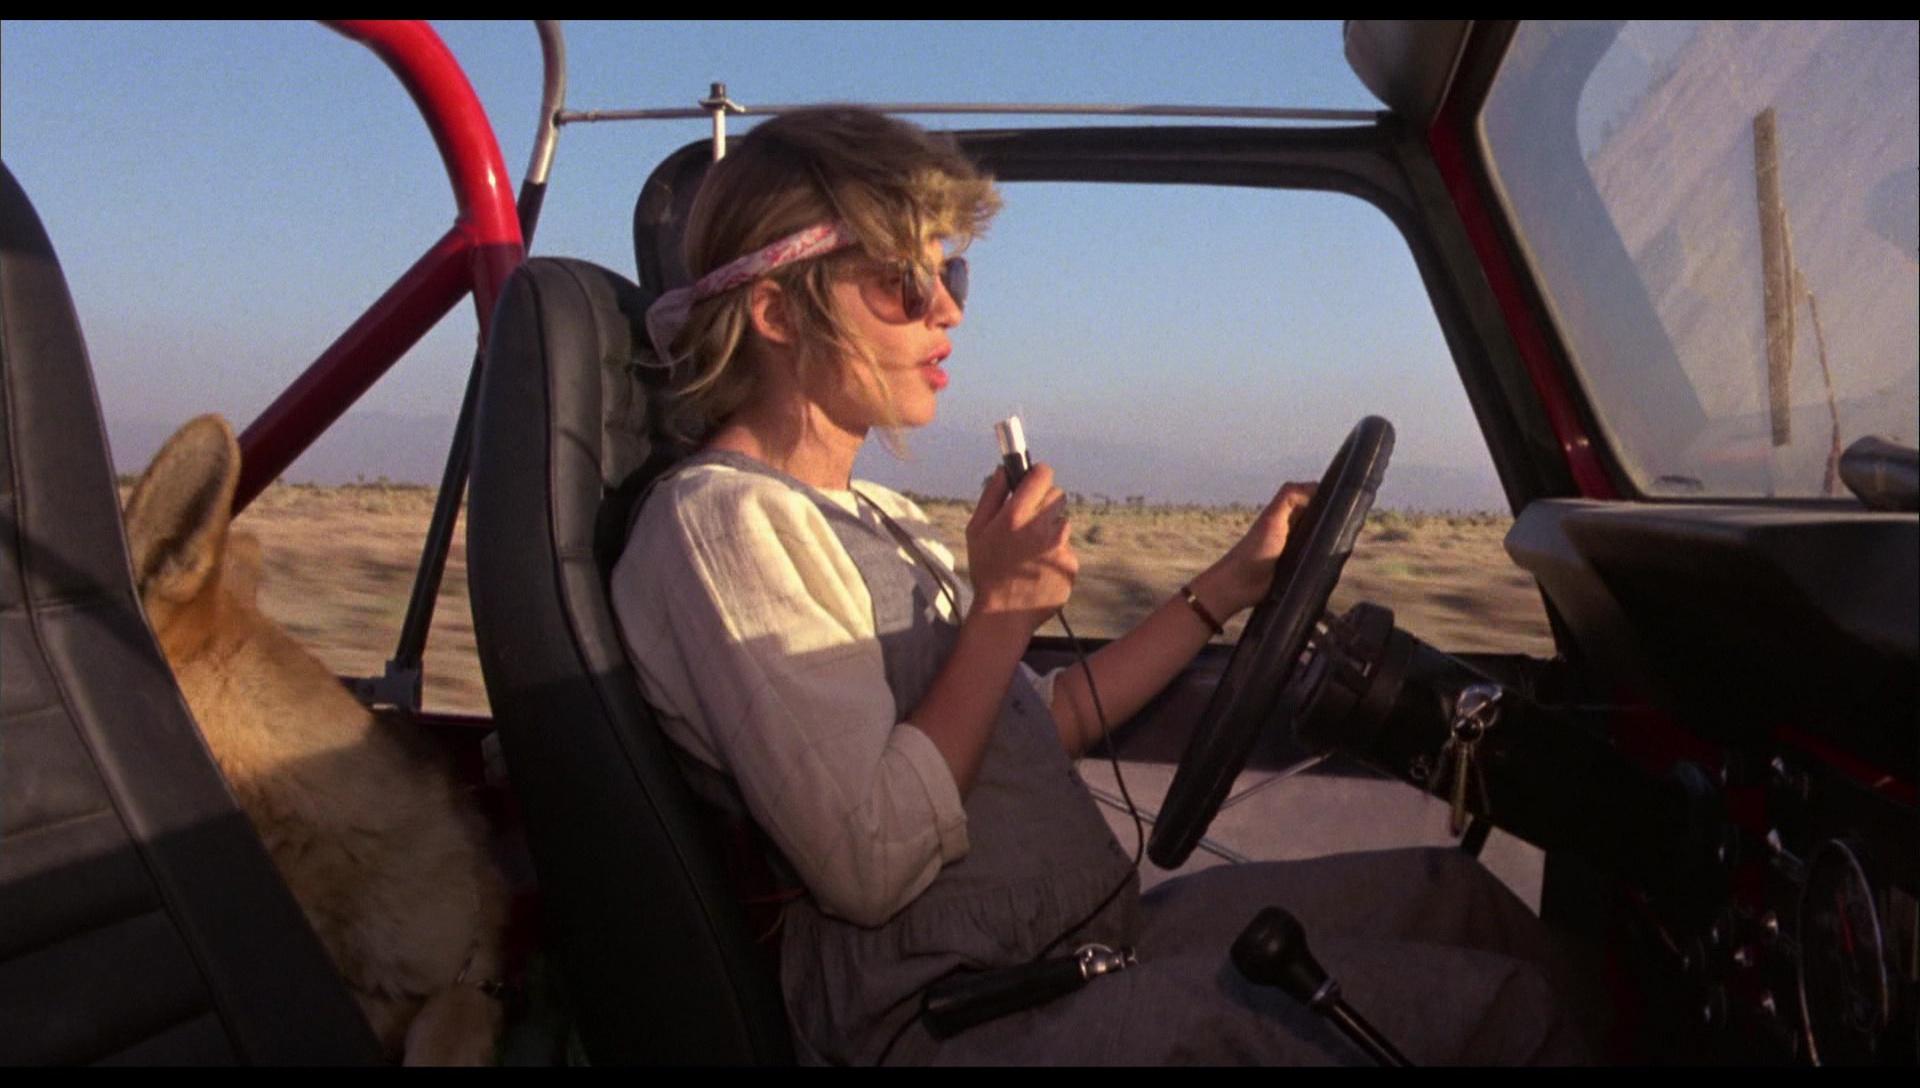 Red Jeep CJ-7 Renegade Car Driven by Linda Hamilton (Sarah ...